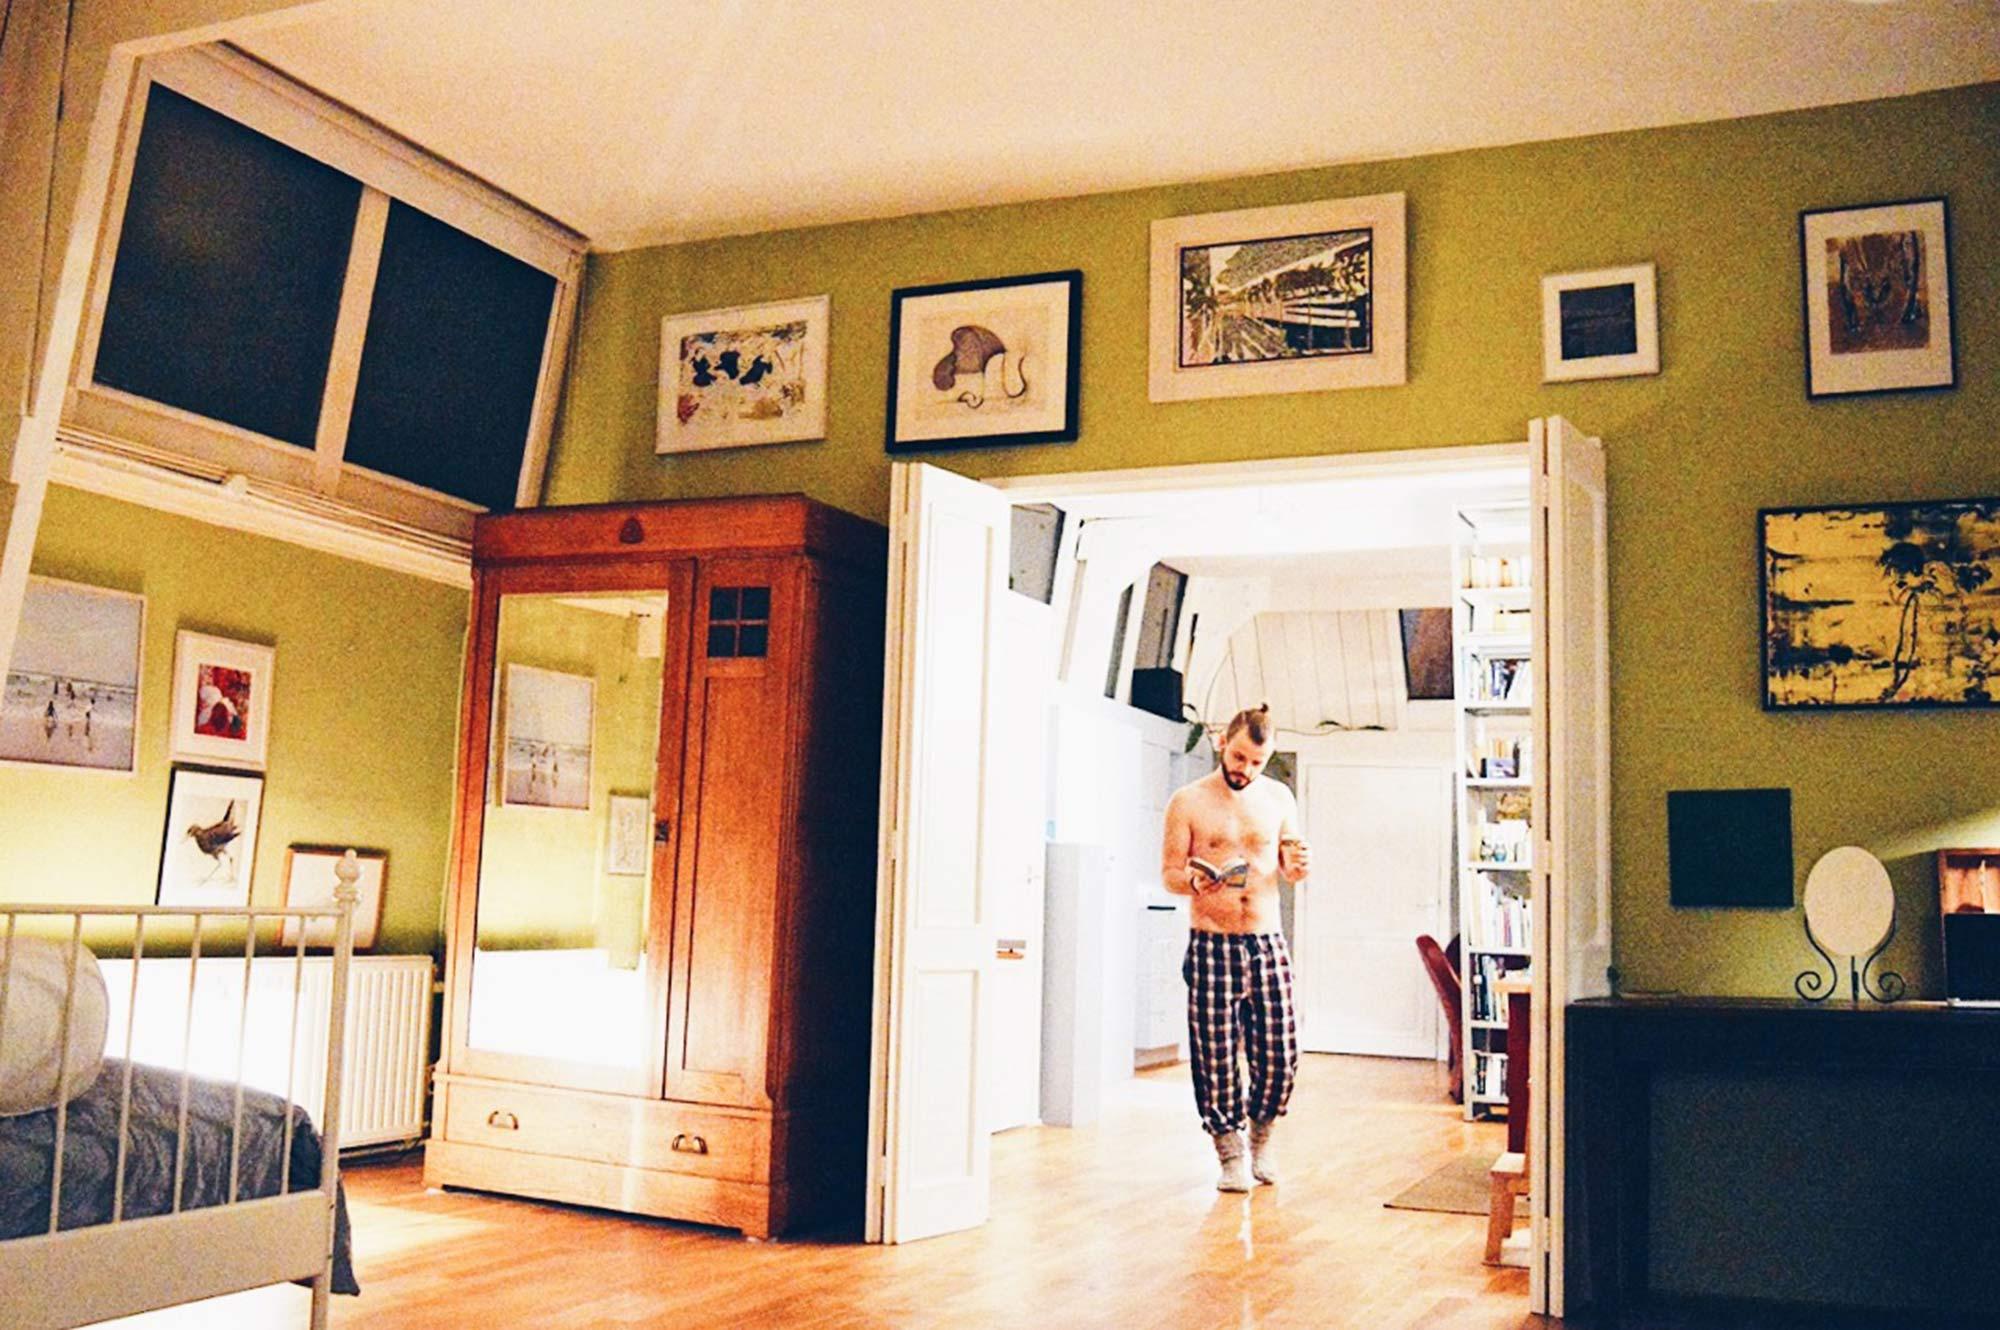 Gay Couple City Weekend The Hague © CoupleofMen.com